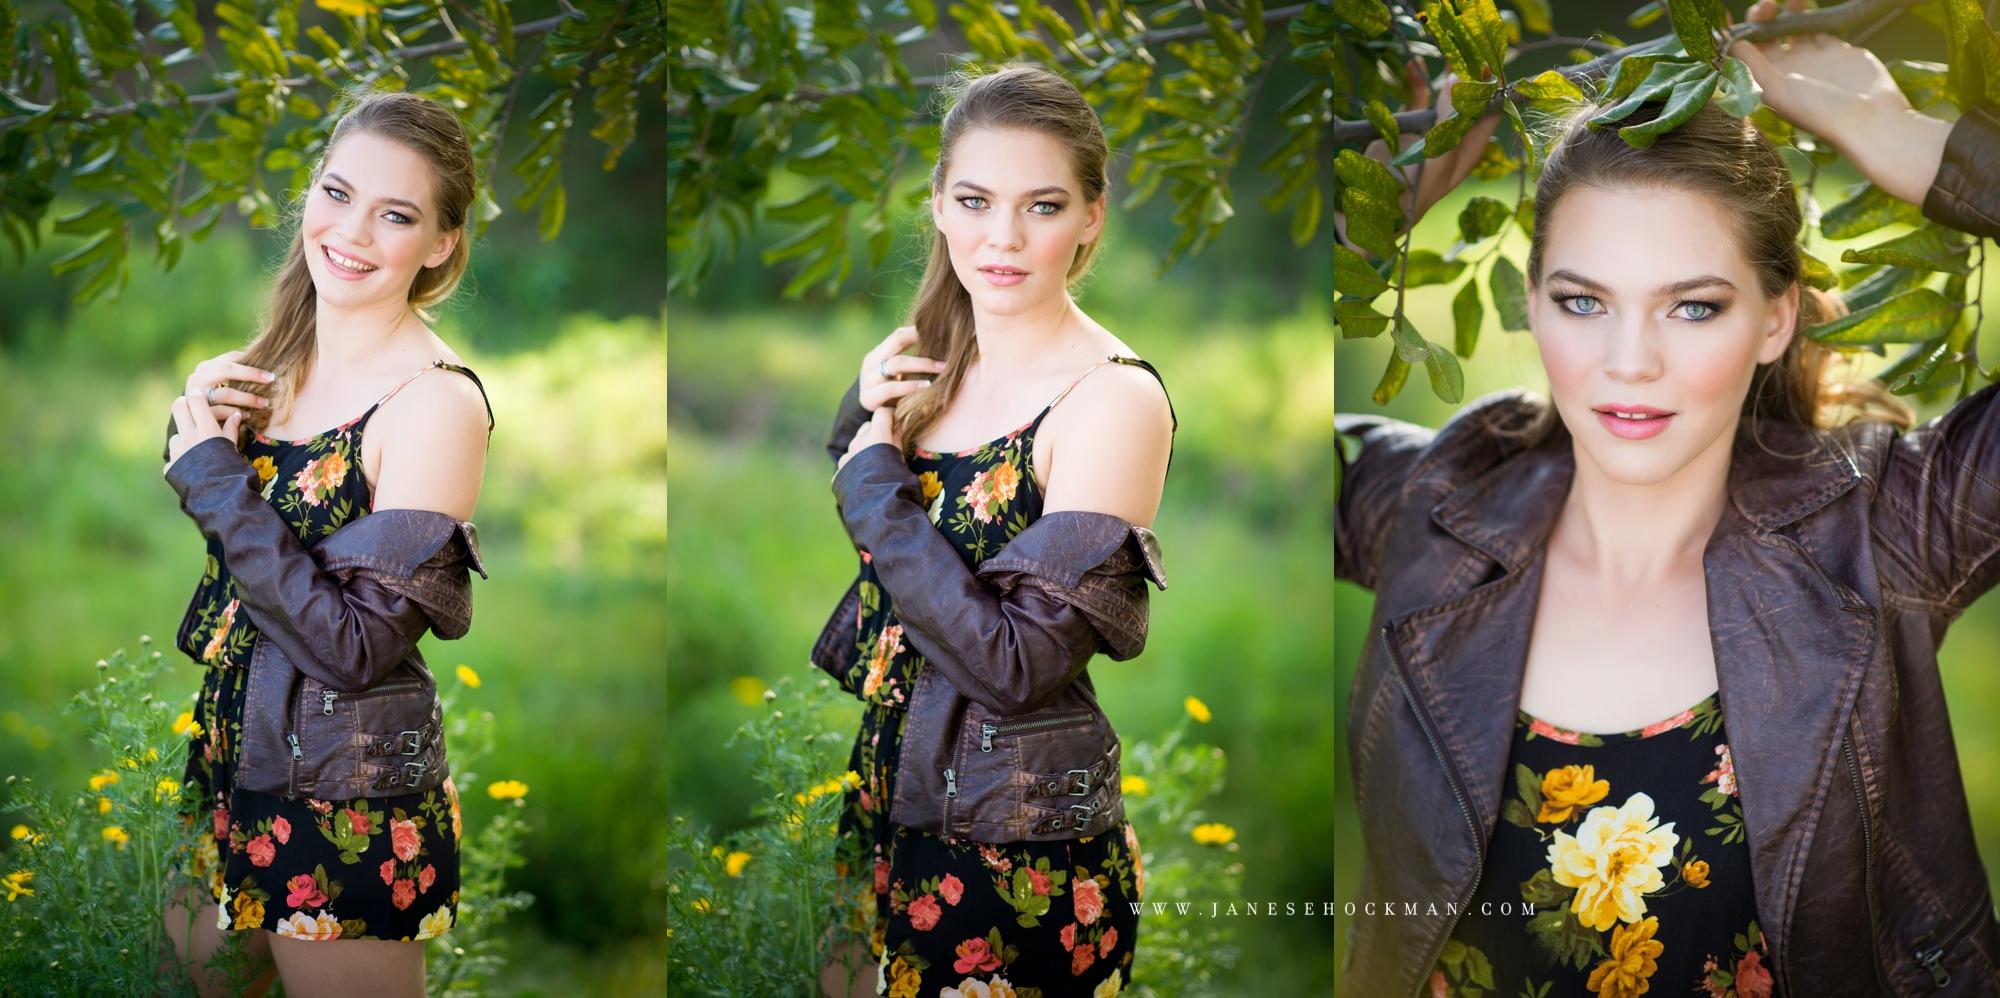 Holly   Janese Hockman Photography   San Luis Obispo, California   High School Senior Portraits   Huntington Beach 1.jpg